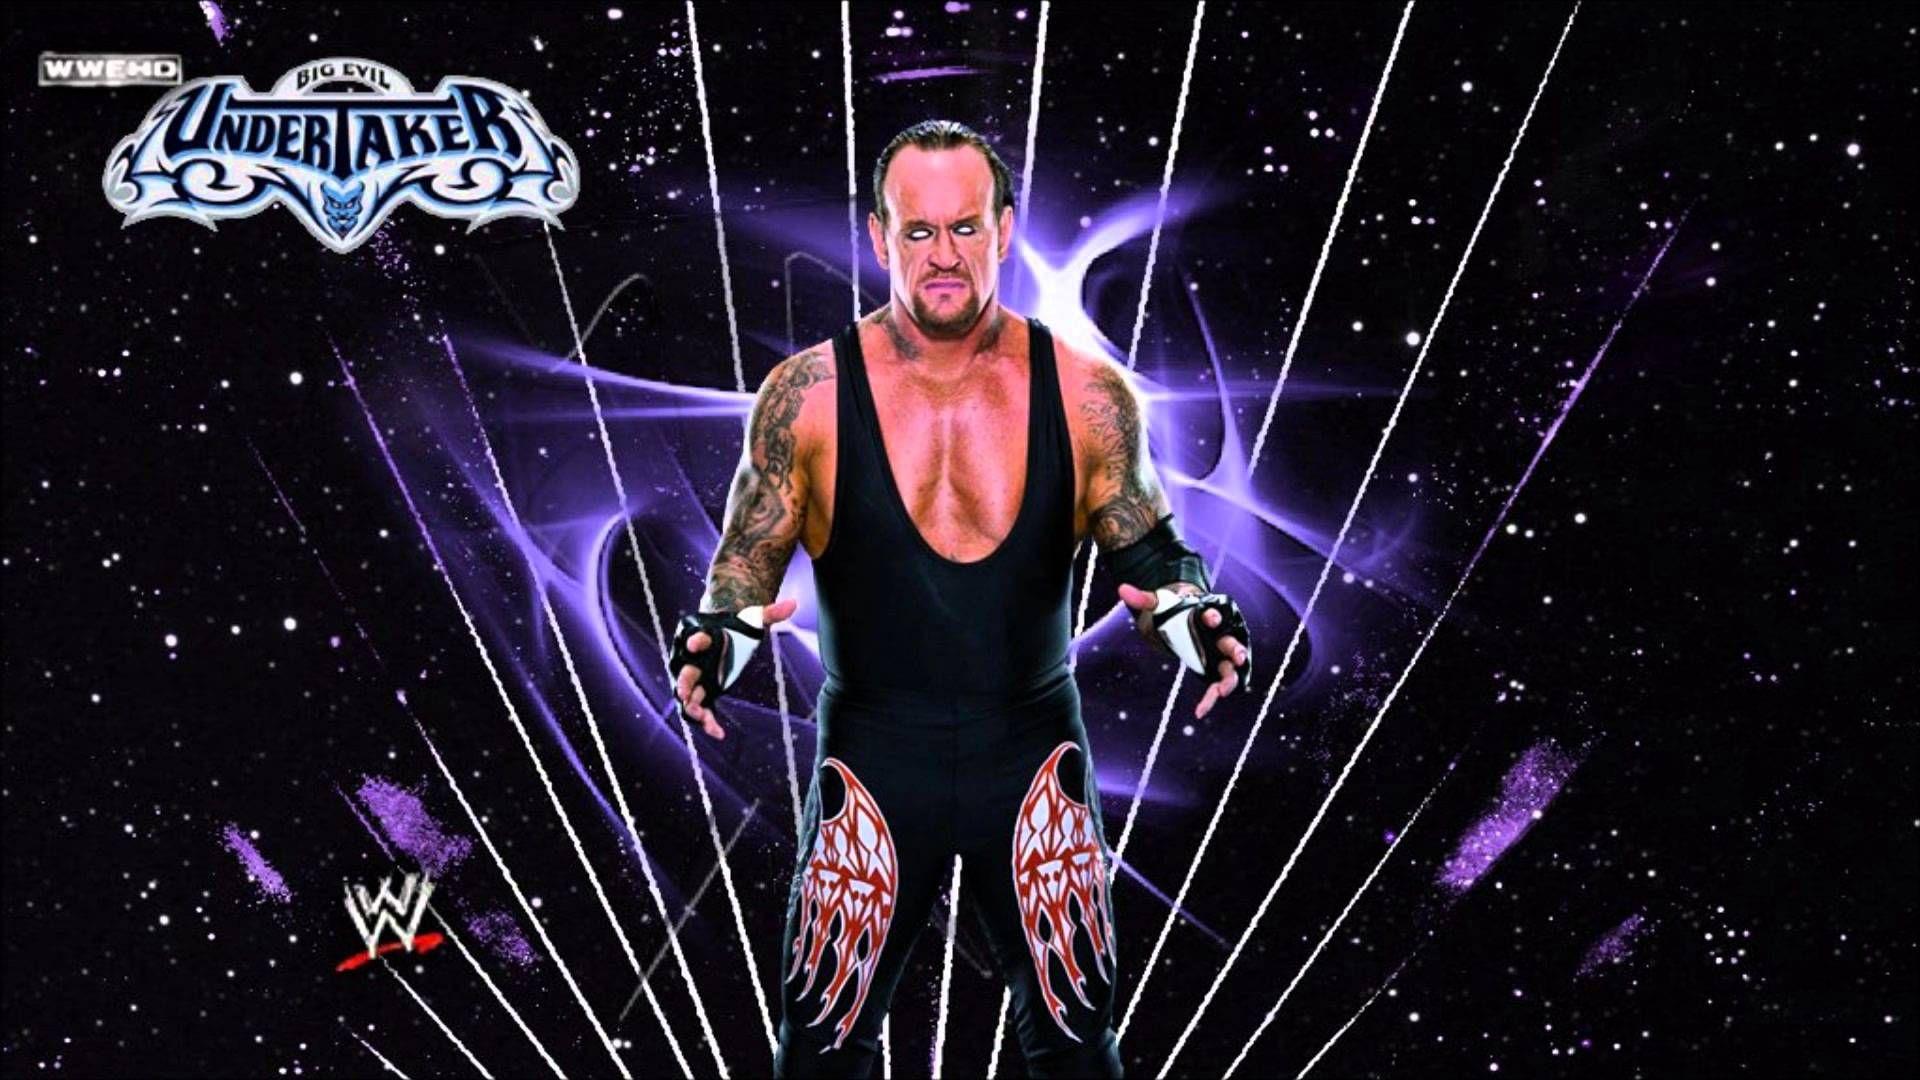 Free Download Kane Old Theme Song Undertaker Wwe Undertaker Wwe